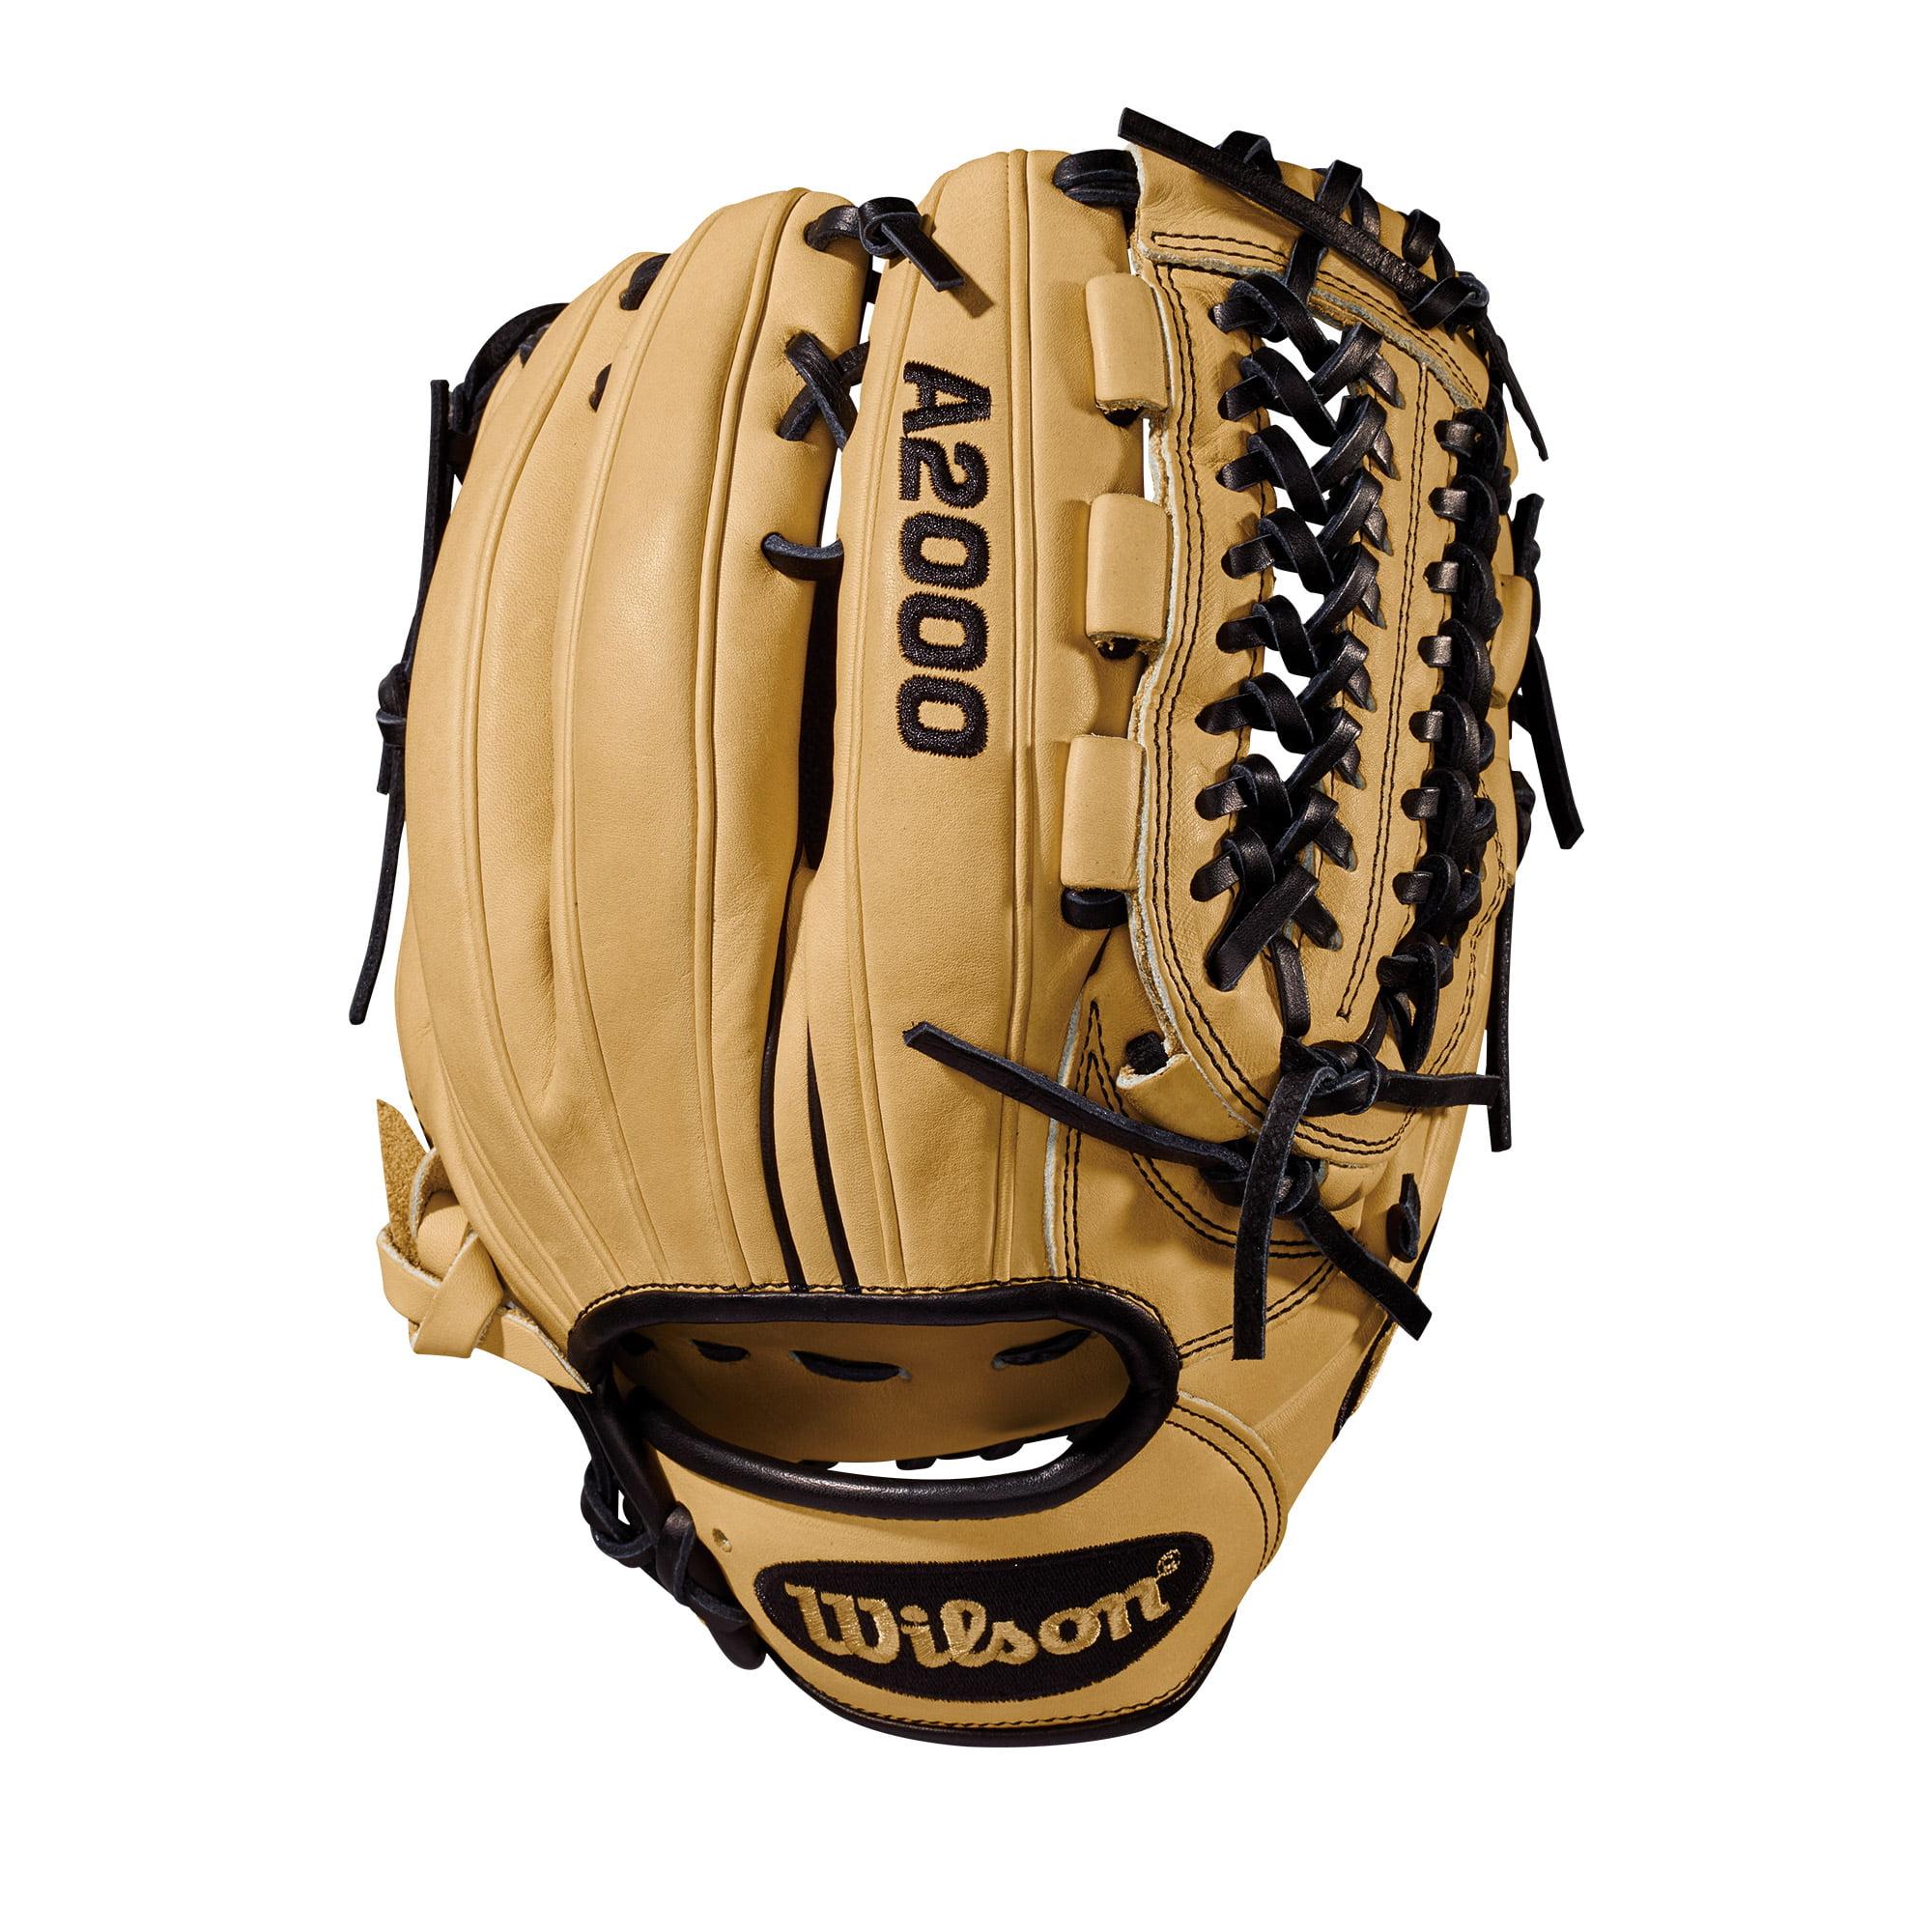 "Wilson 11.75"" A2000 D33 Pitcher Right-Hand Throw Baseball Glove - Cream - Right Hand Throw"